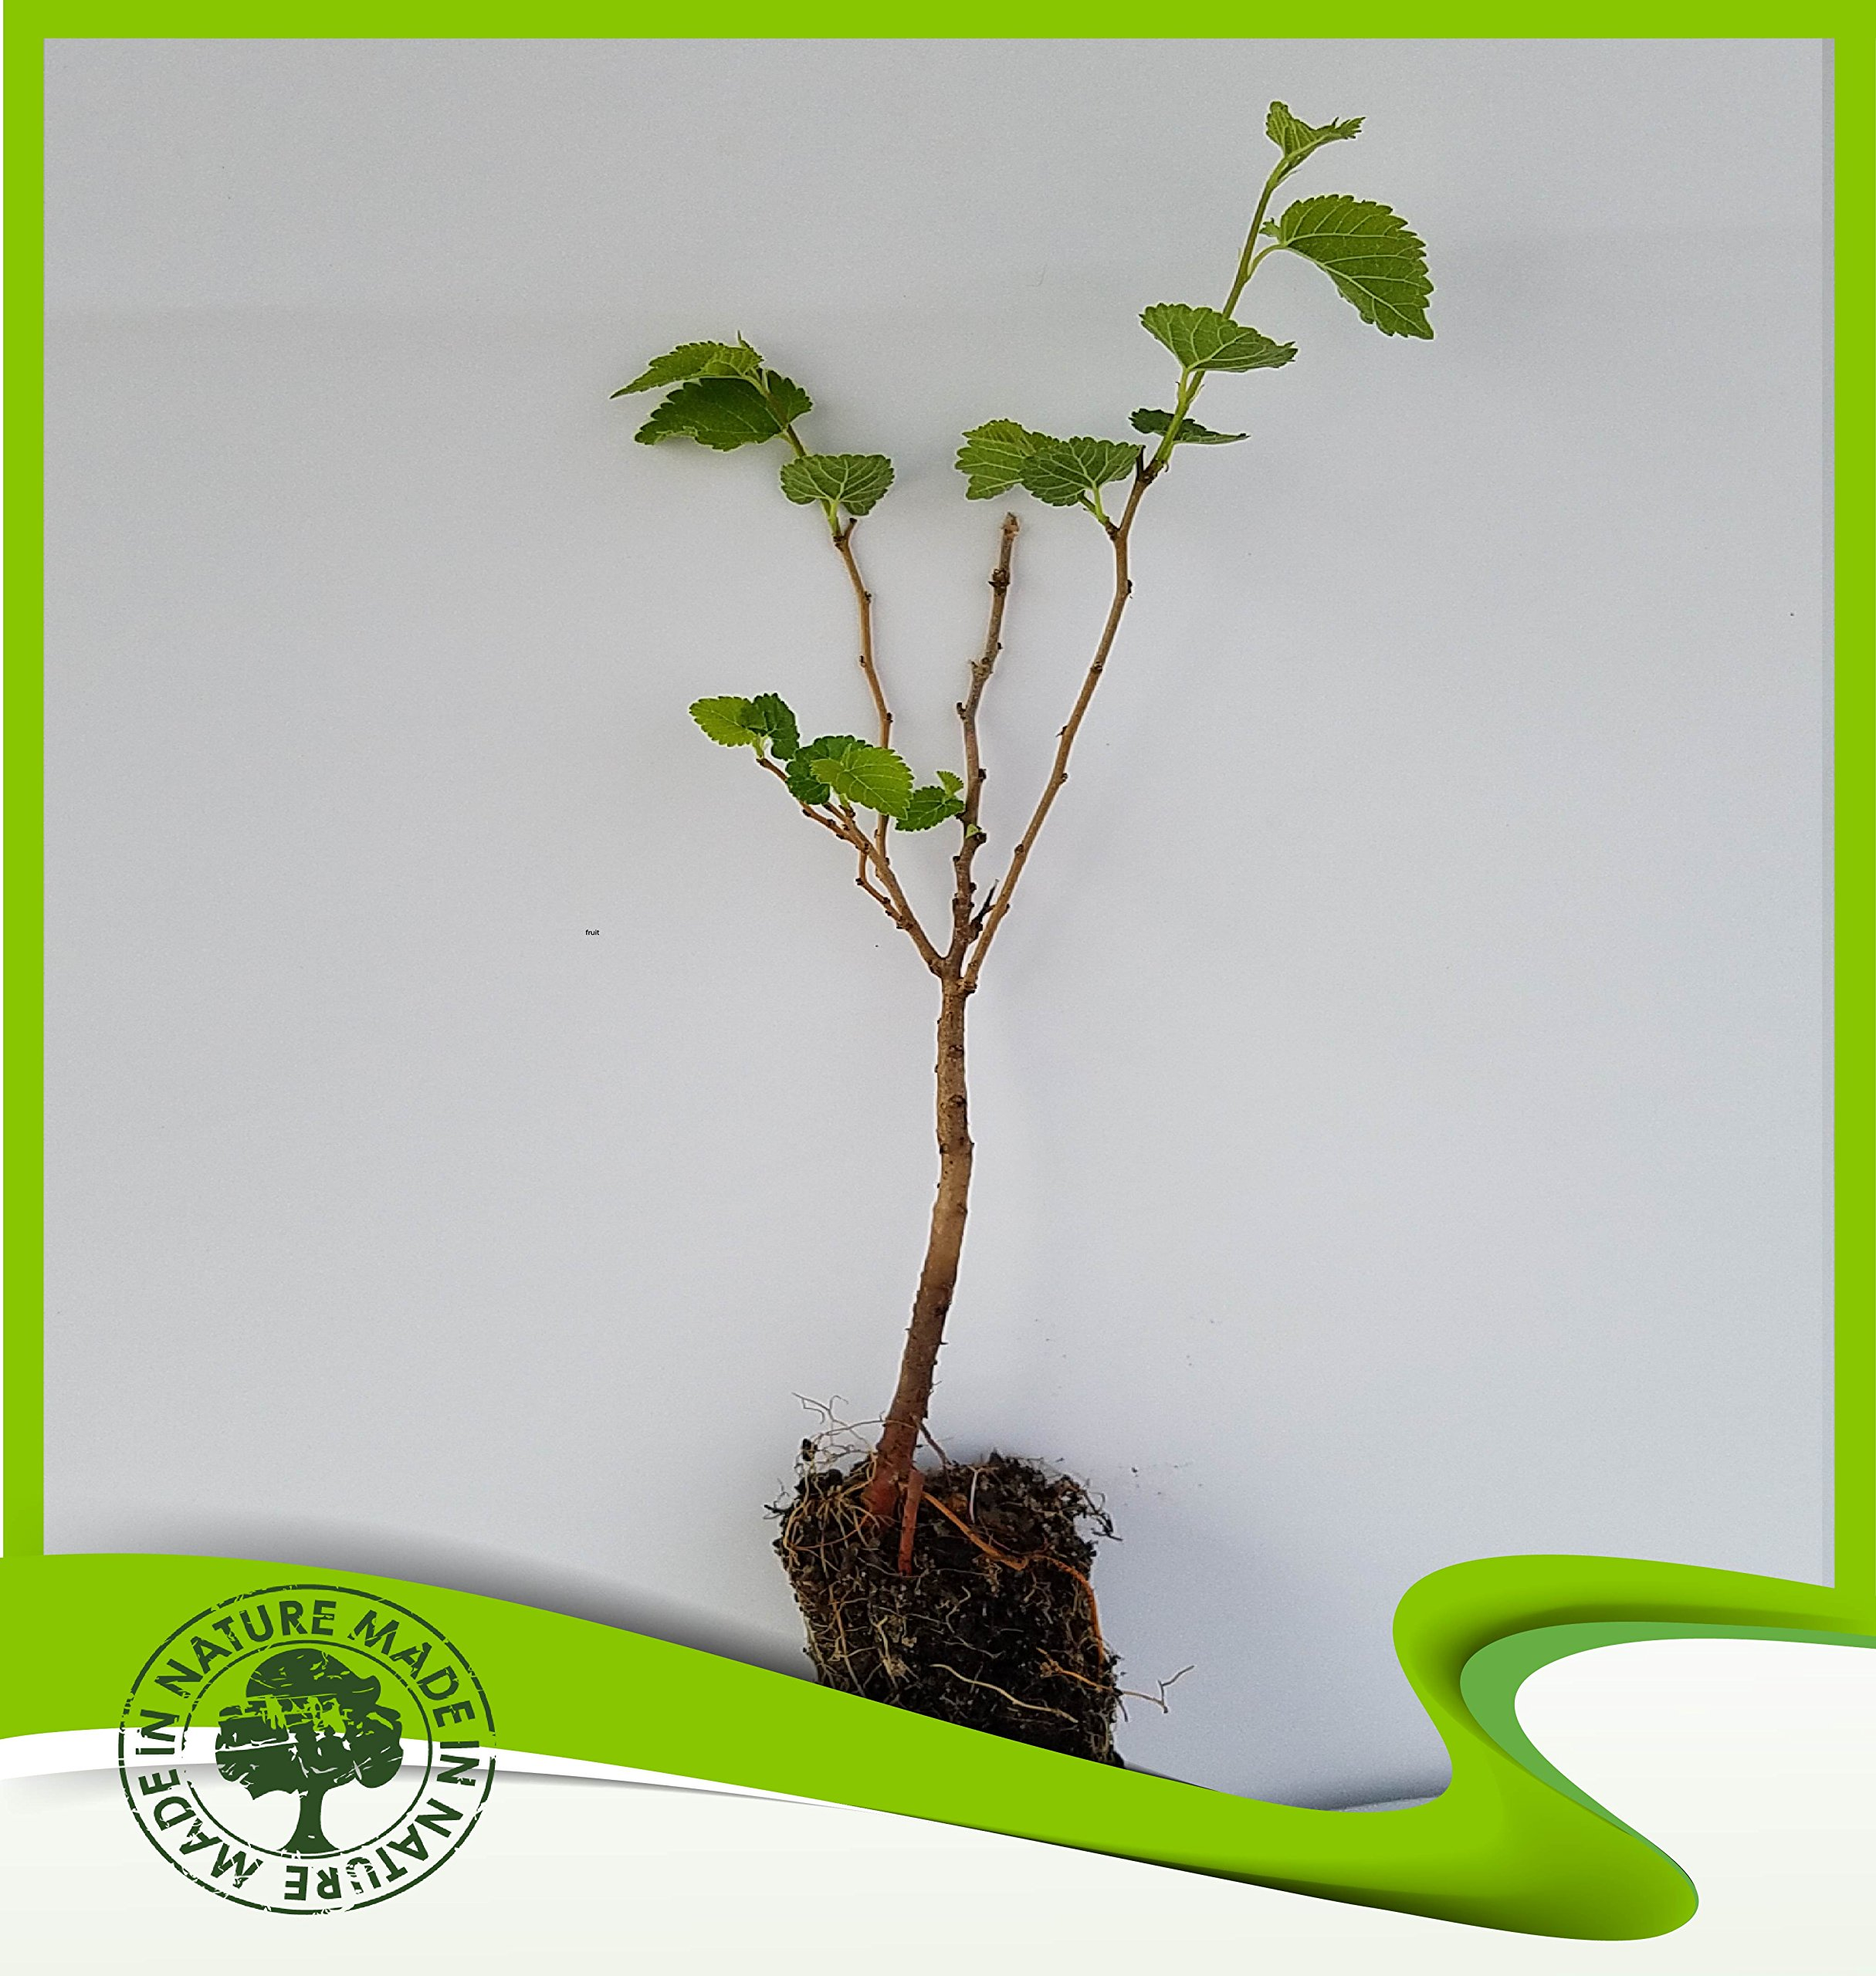 Morus alba (White mulberry) - Plant